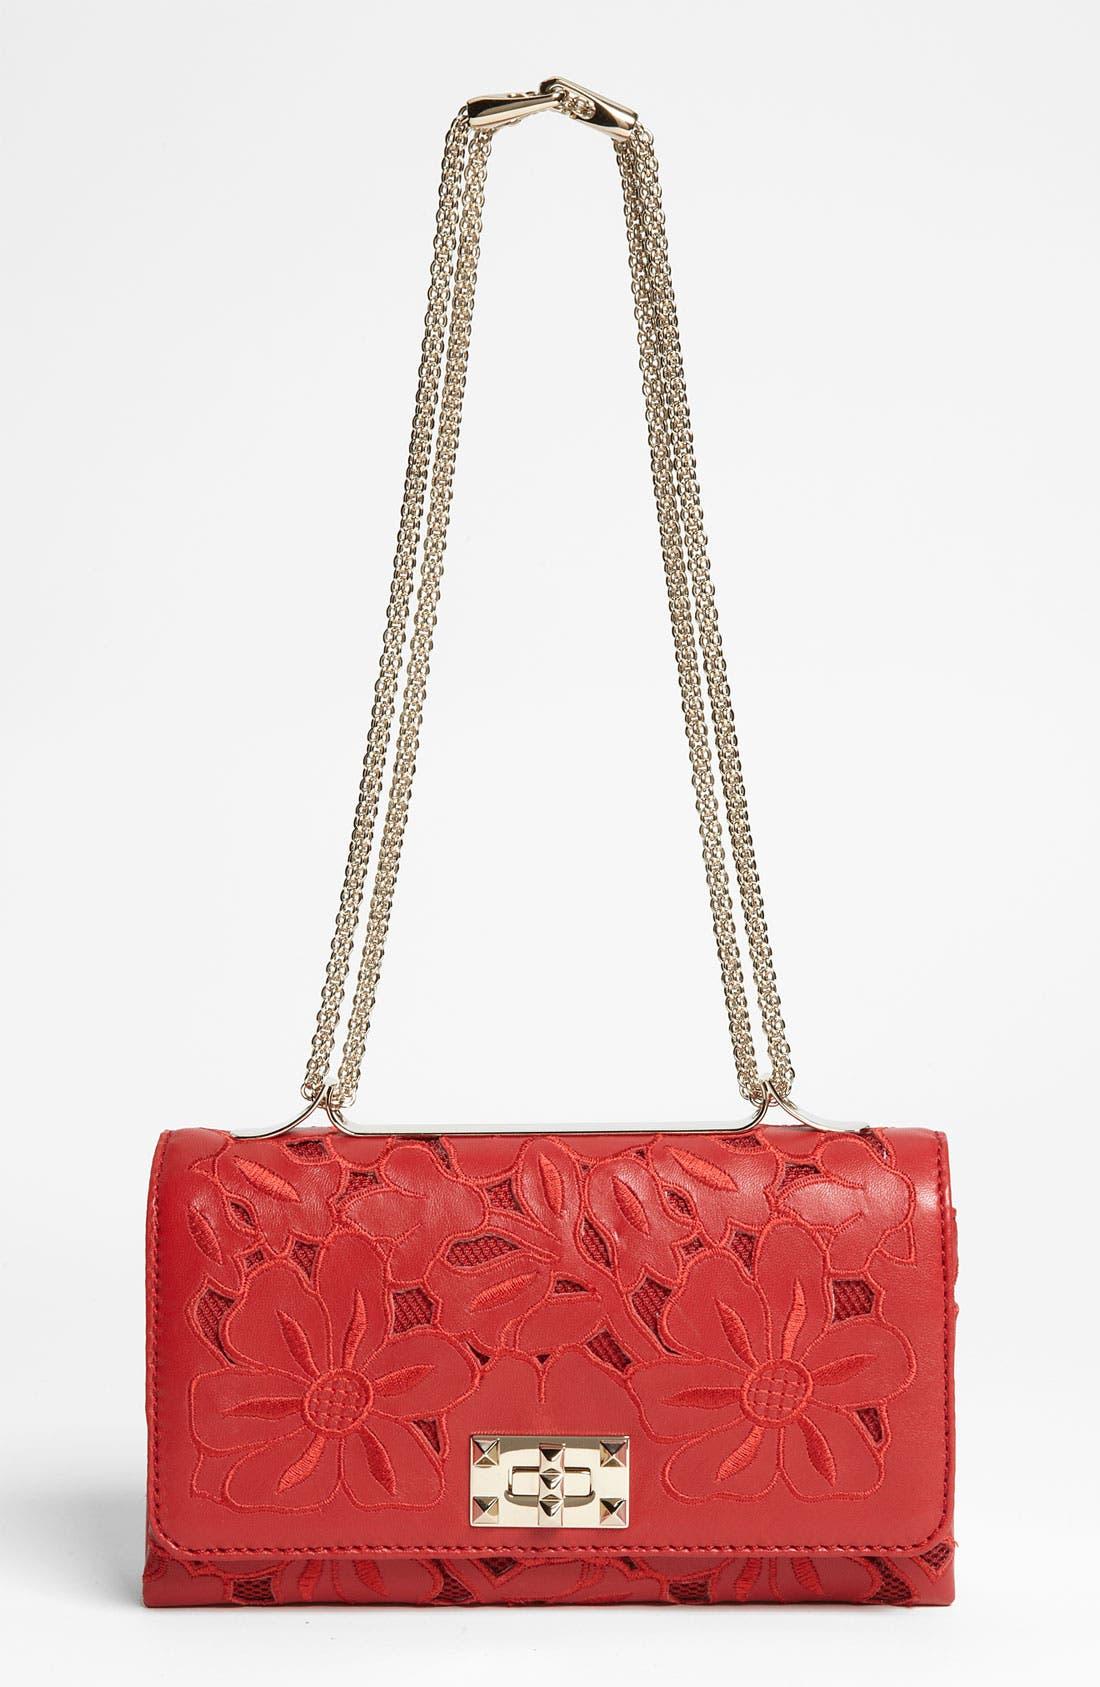 Alternate Image 1 Selected - Valentino 'Girello Flap' Leather Shoulder Bag